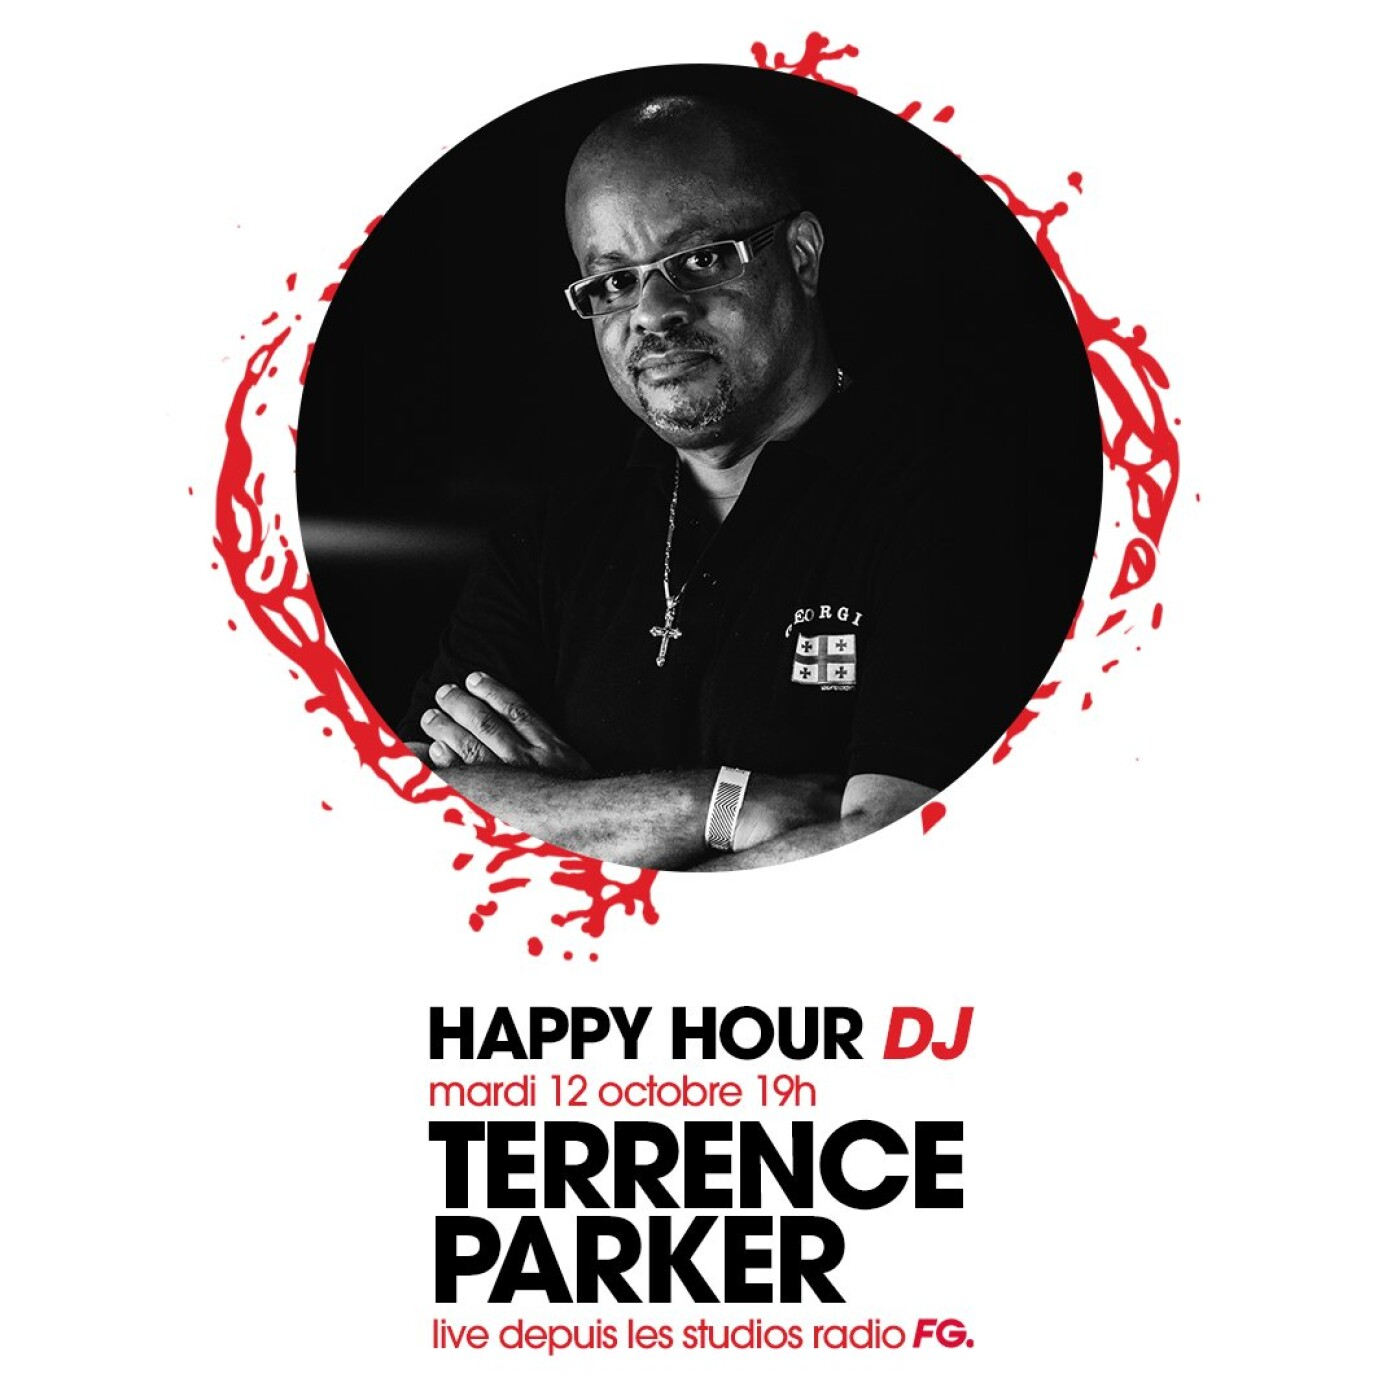 HAPPY HOUR DJ : TERRENCE PARKER